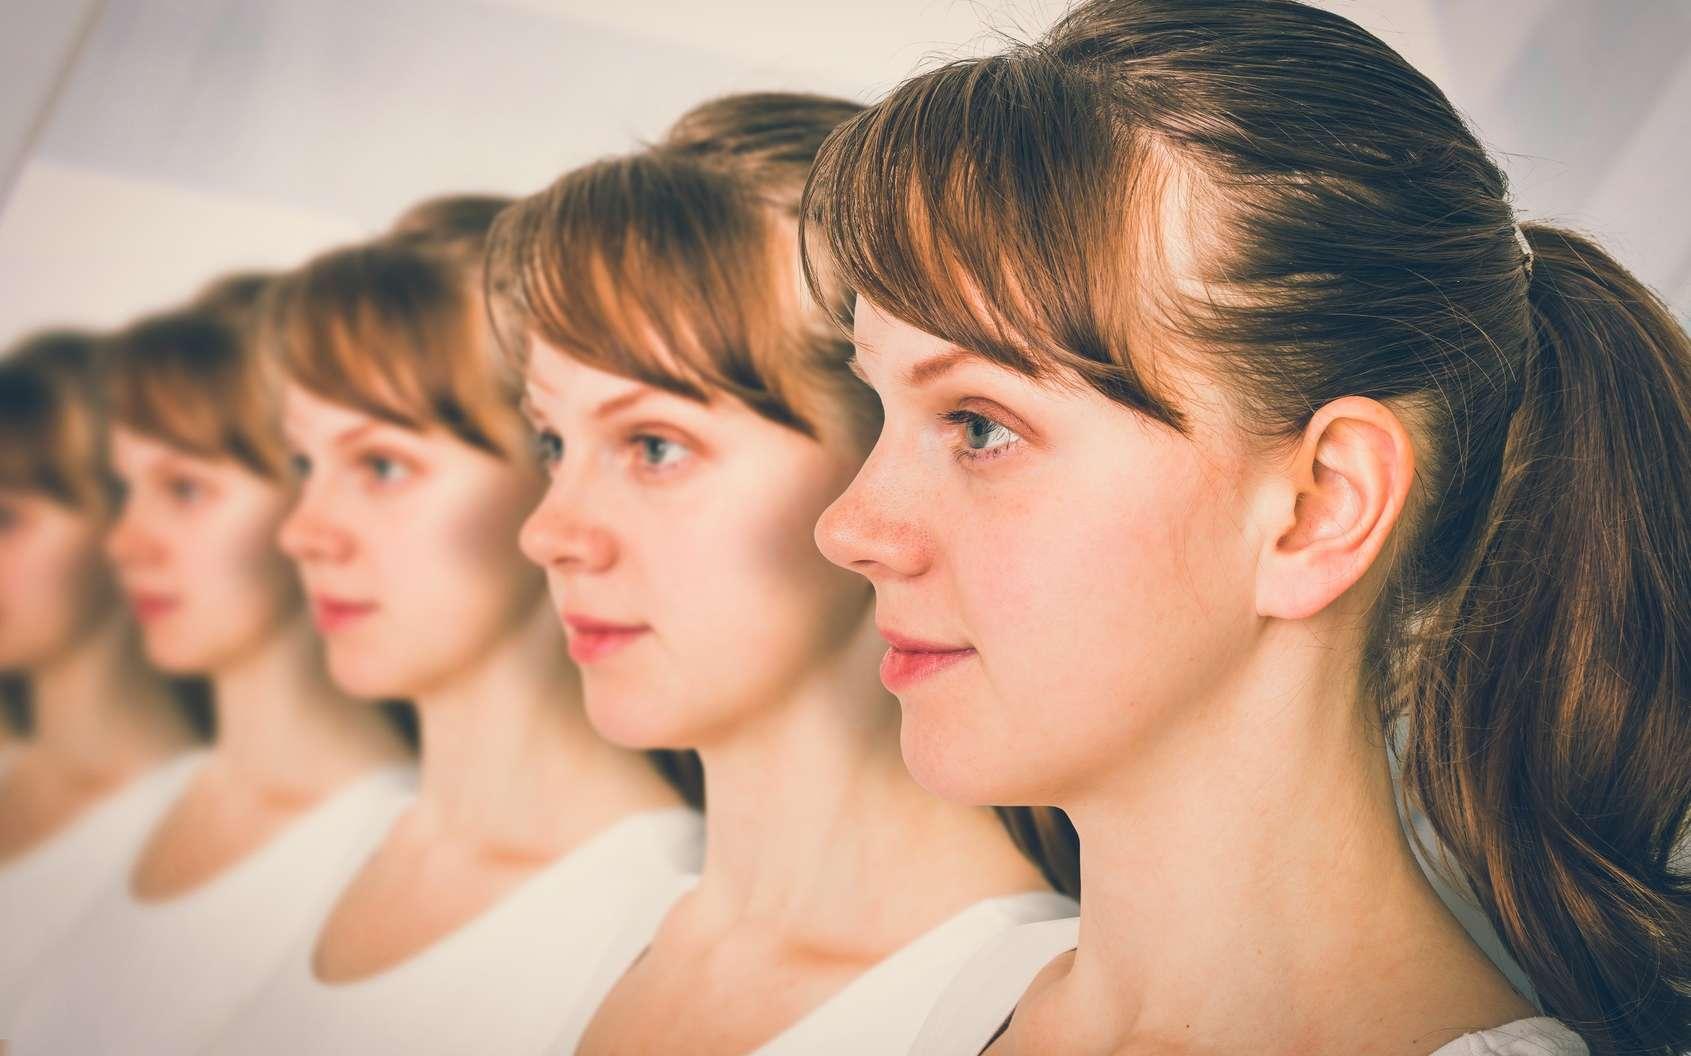 Le clonage permet d'obtenir des individus identiques. © andriano_cz, Fotolia